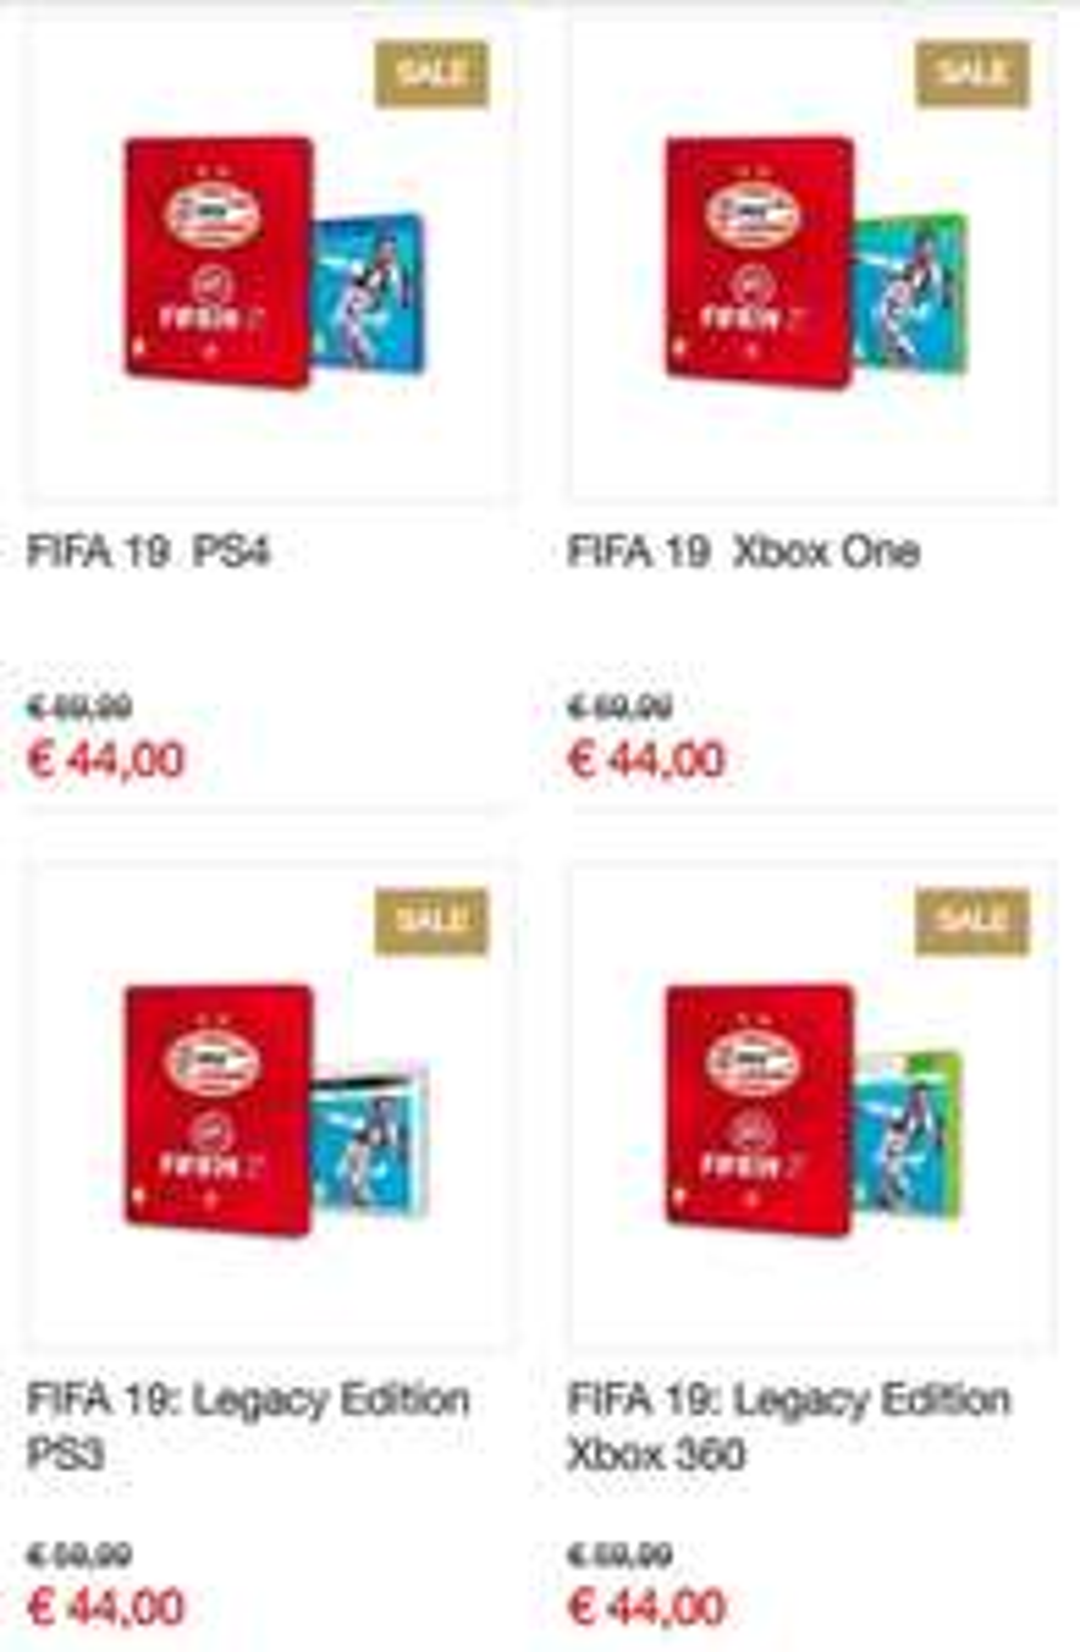 Fifa 19 + PSV cover [PSVfanstore]